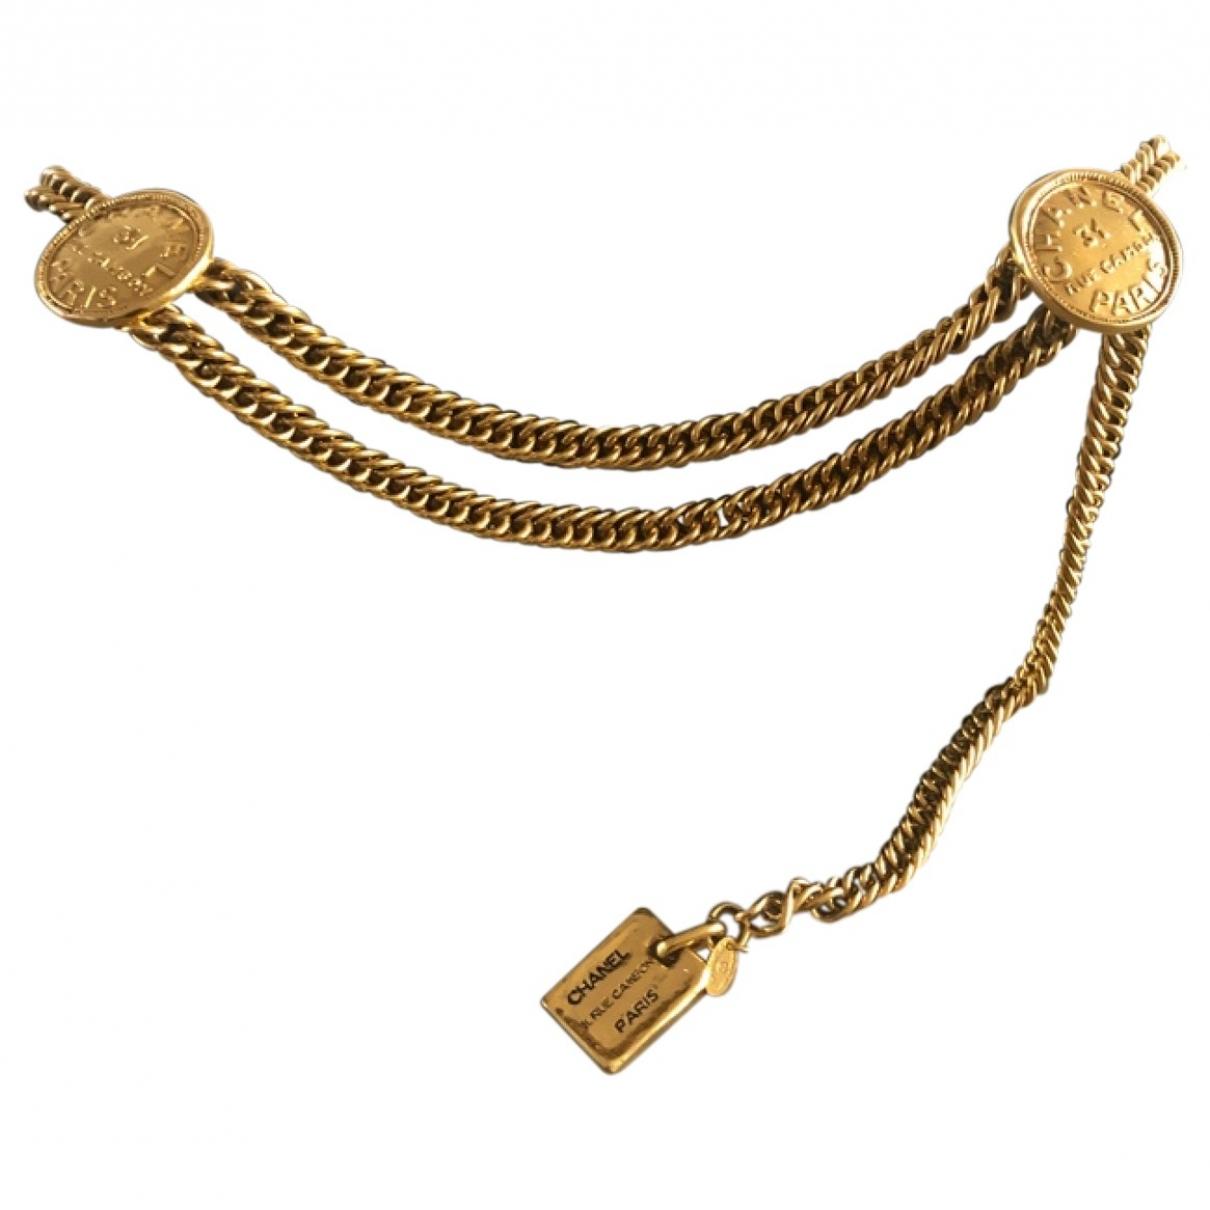 Chanel \N Gold Chain belt for Women 85 cm